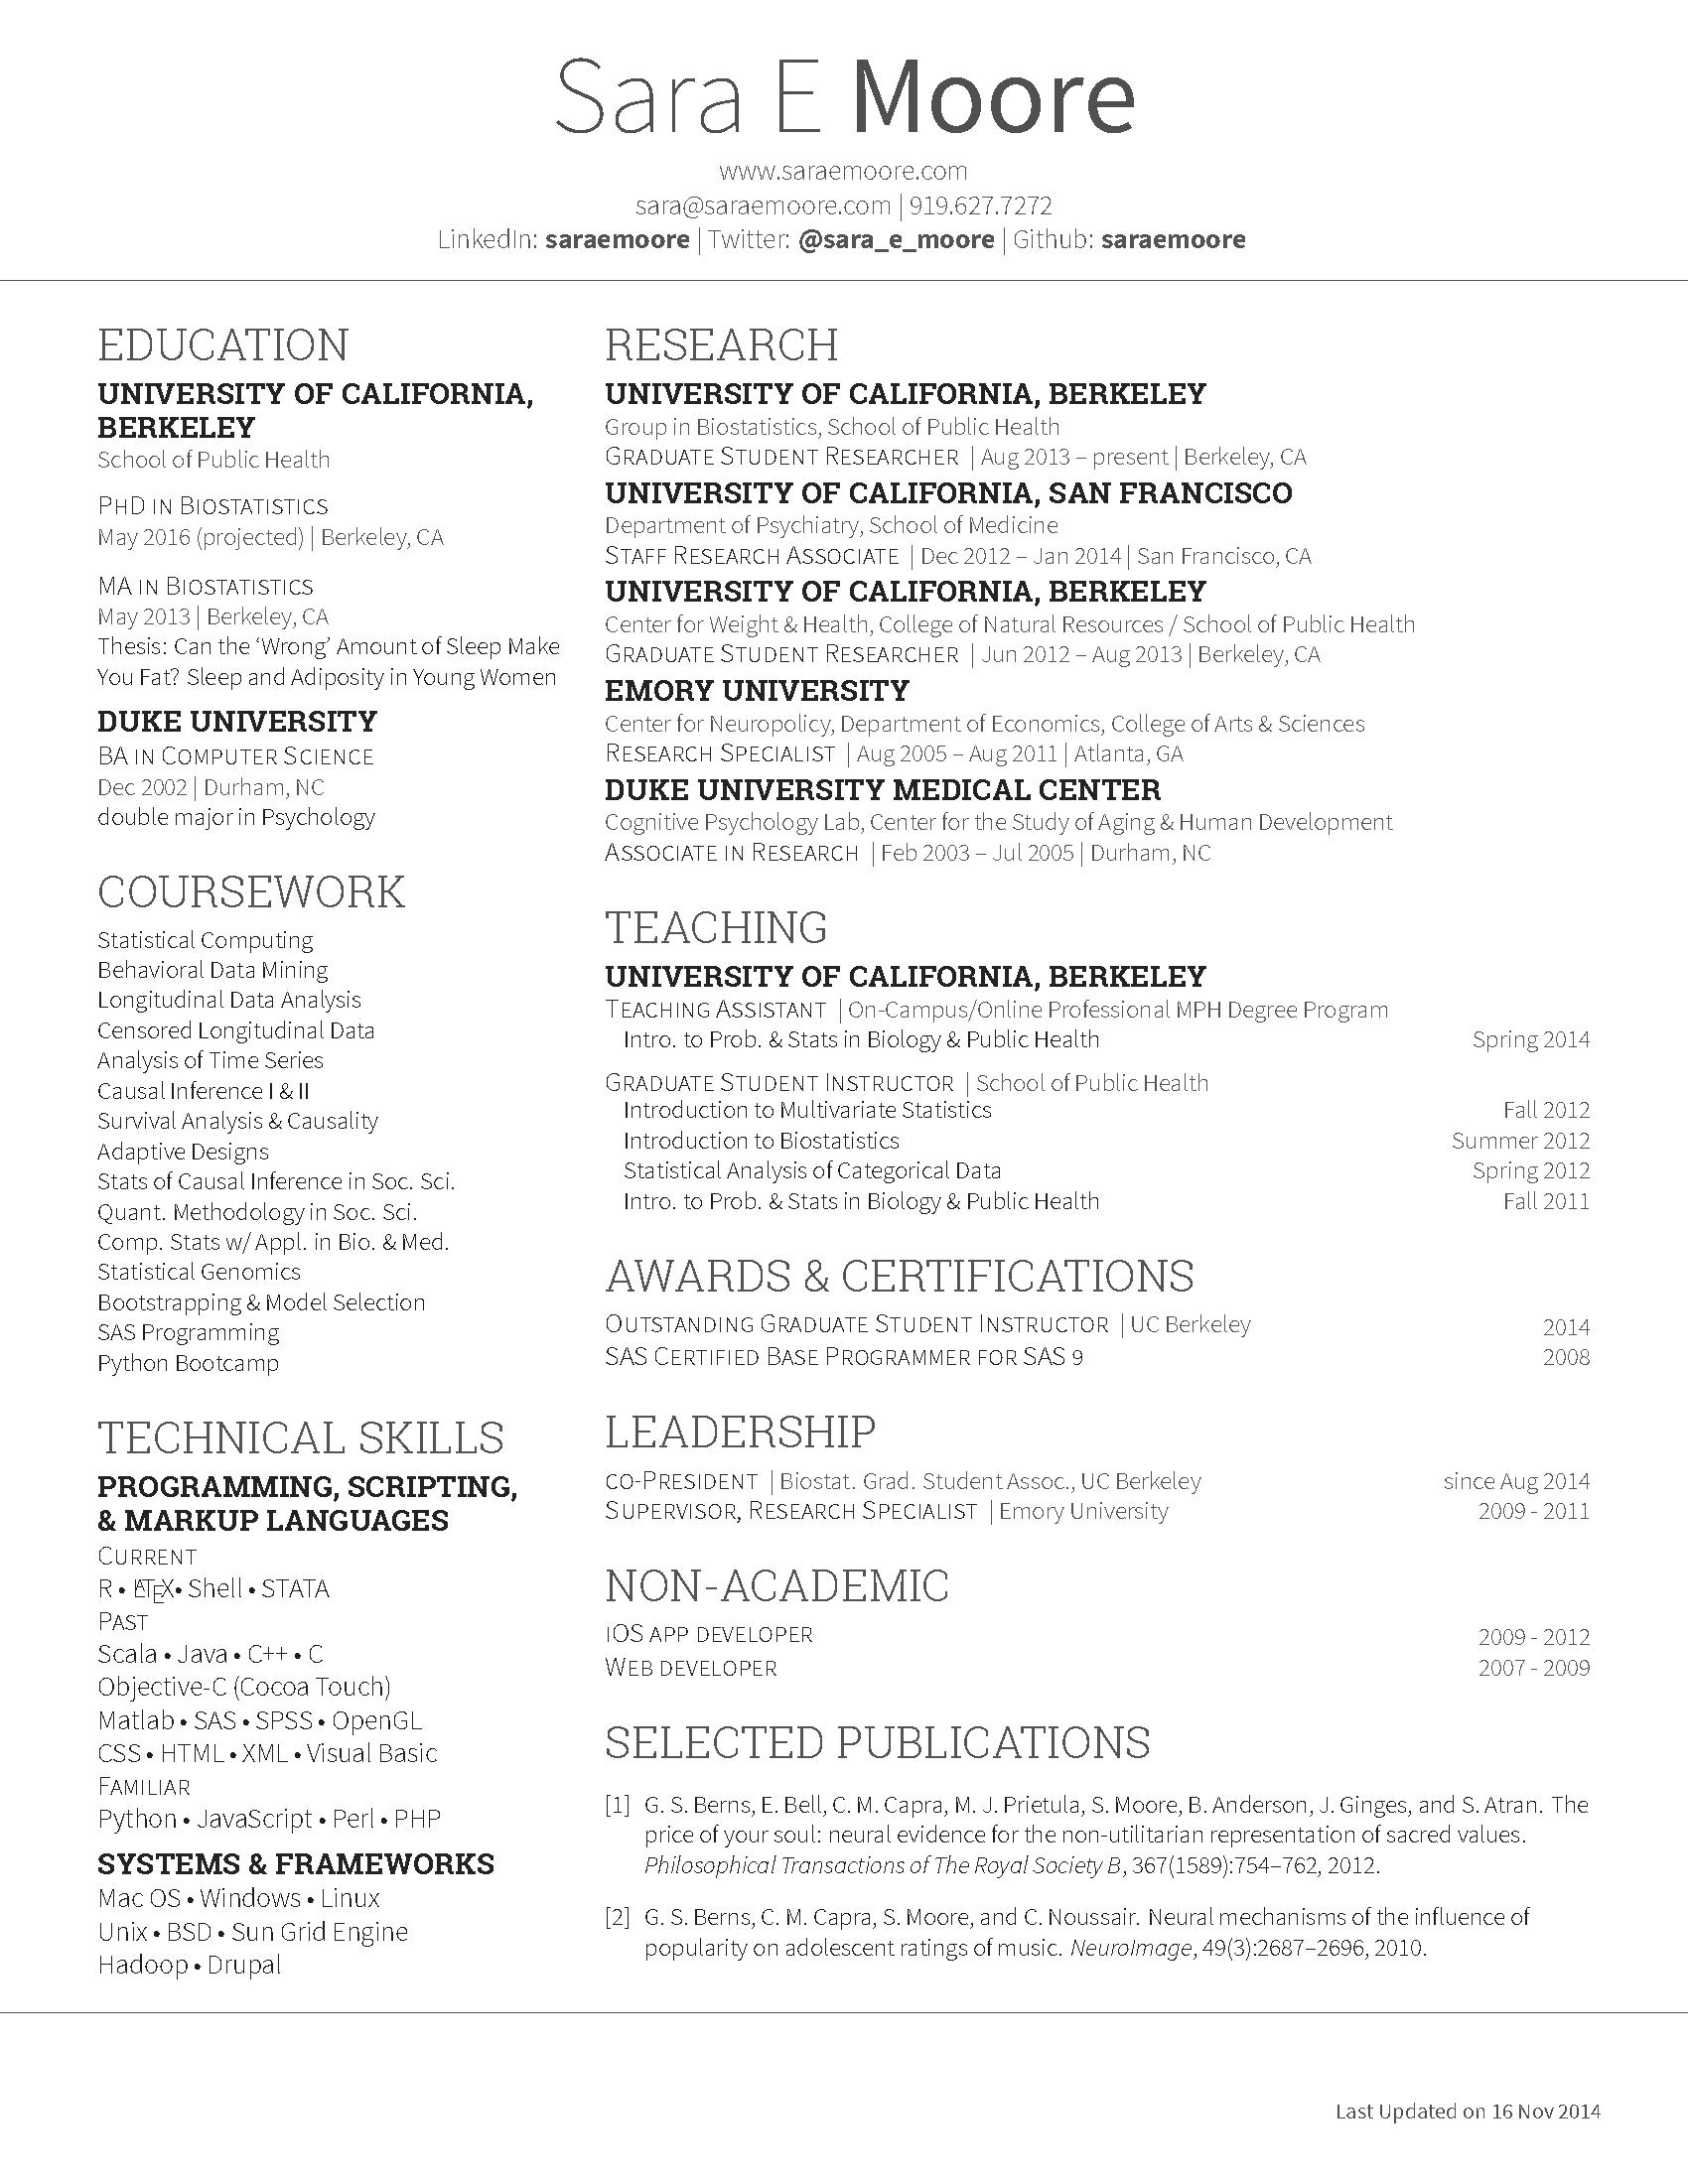 Xelatex Cv Template   1-Cv Template   Cv template, Resume